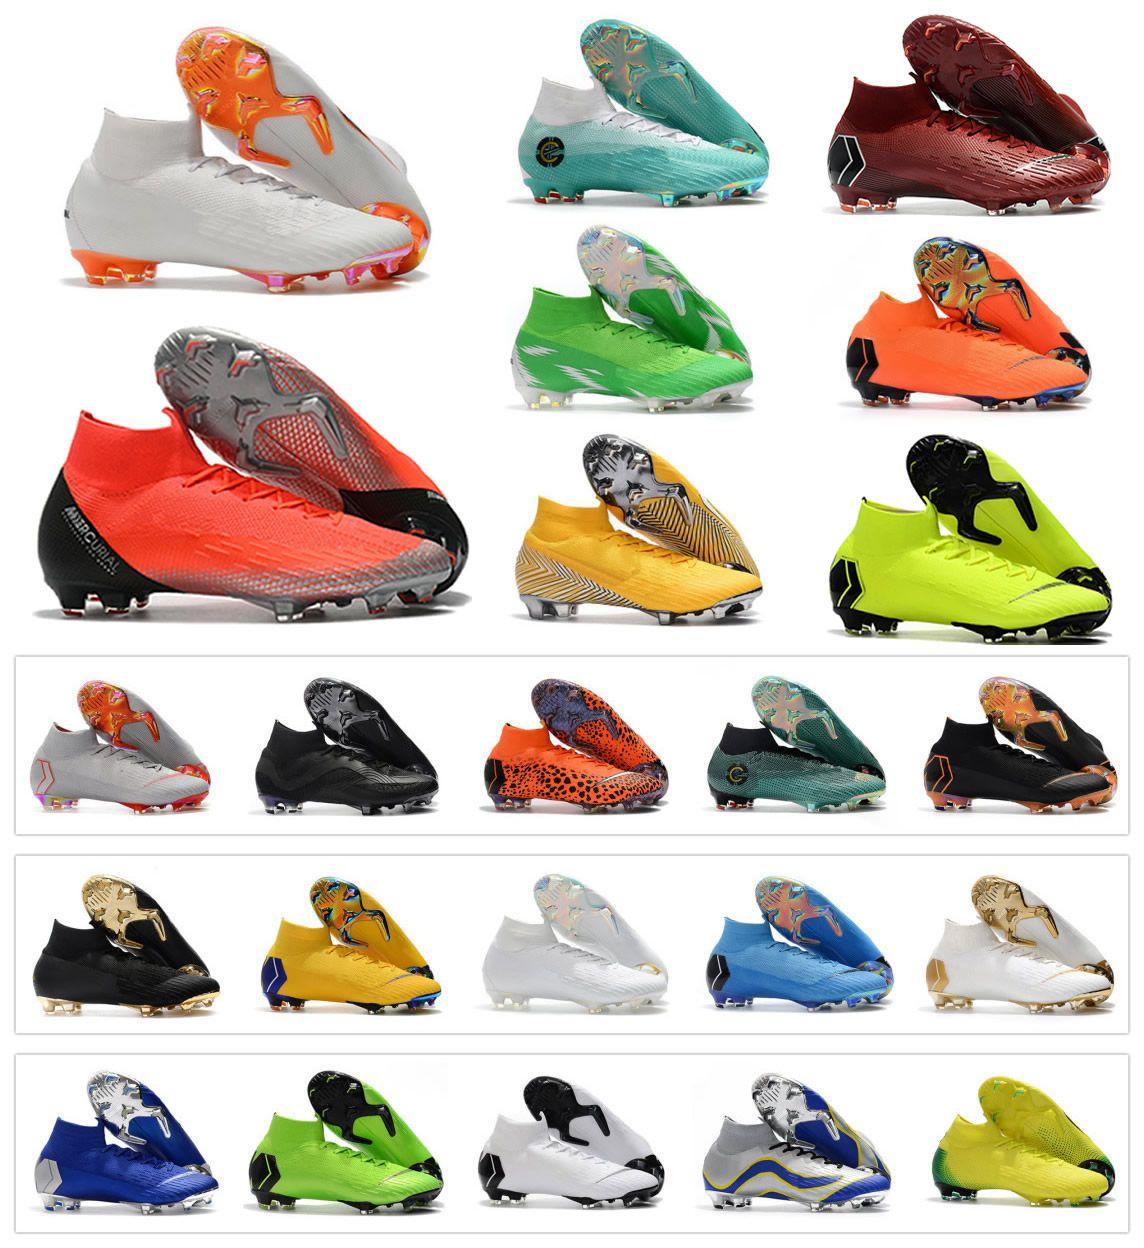 Hot Mercurial Superfly VI 360 Elite FG KJ 6 XII 12 CR7 Ronaldo Neymar Mens Women  Boys High Soccer Shoes Football Boots Cleats Size 35 45 UK 2019 From ... 0c847bc8f